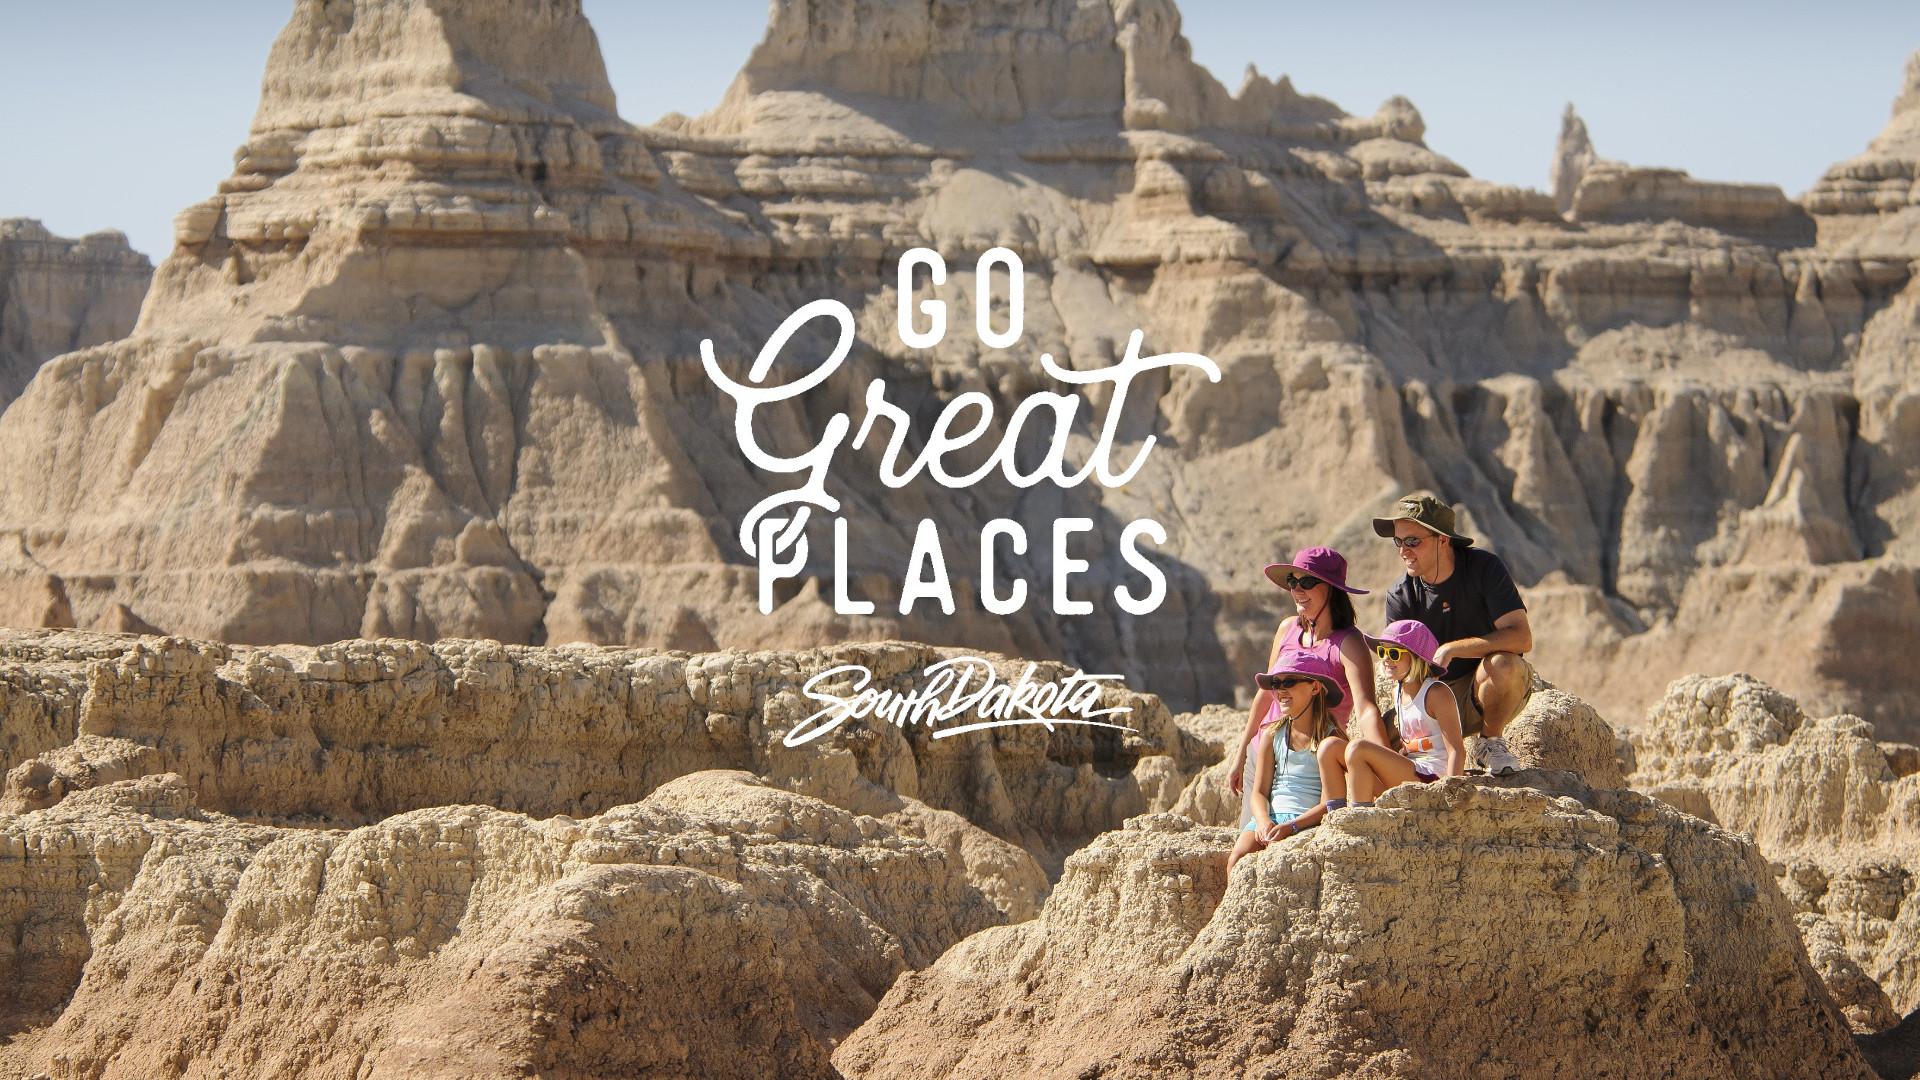 Go Great Places Campaign of South Dakota Tourism